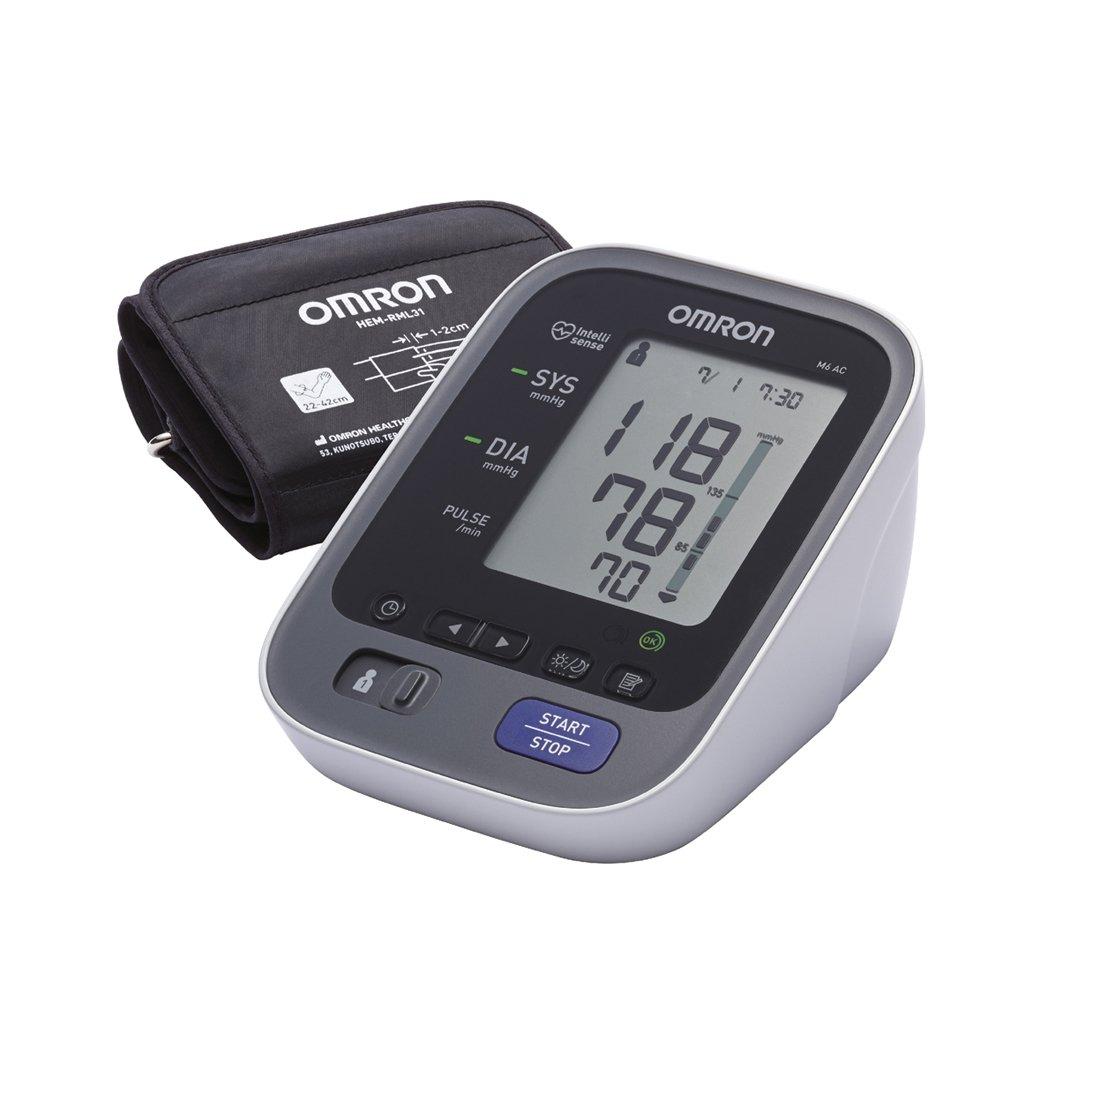 Omron Healthcare M6 Comfort Upper Arm Blood Pressure Monitor